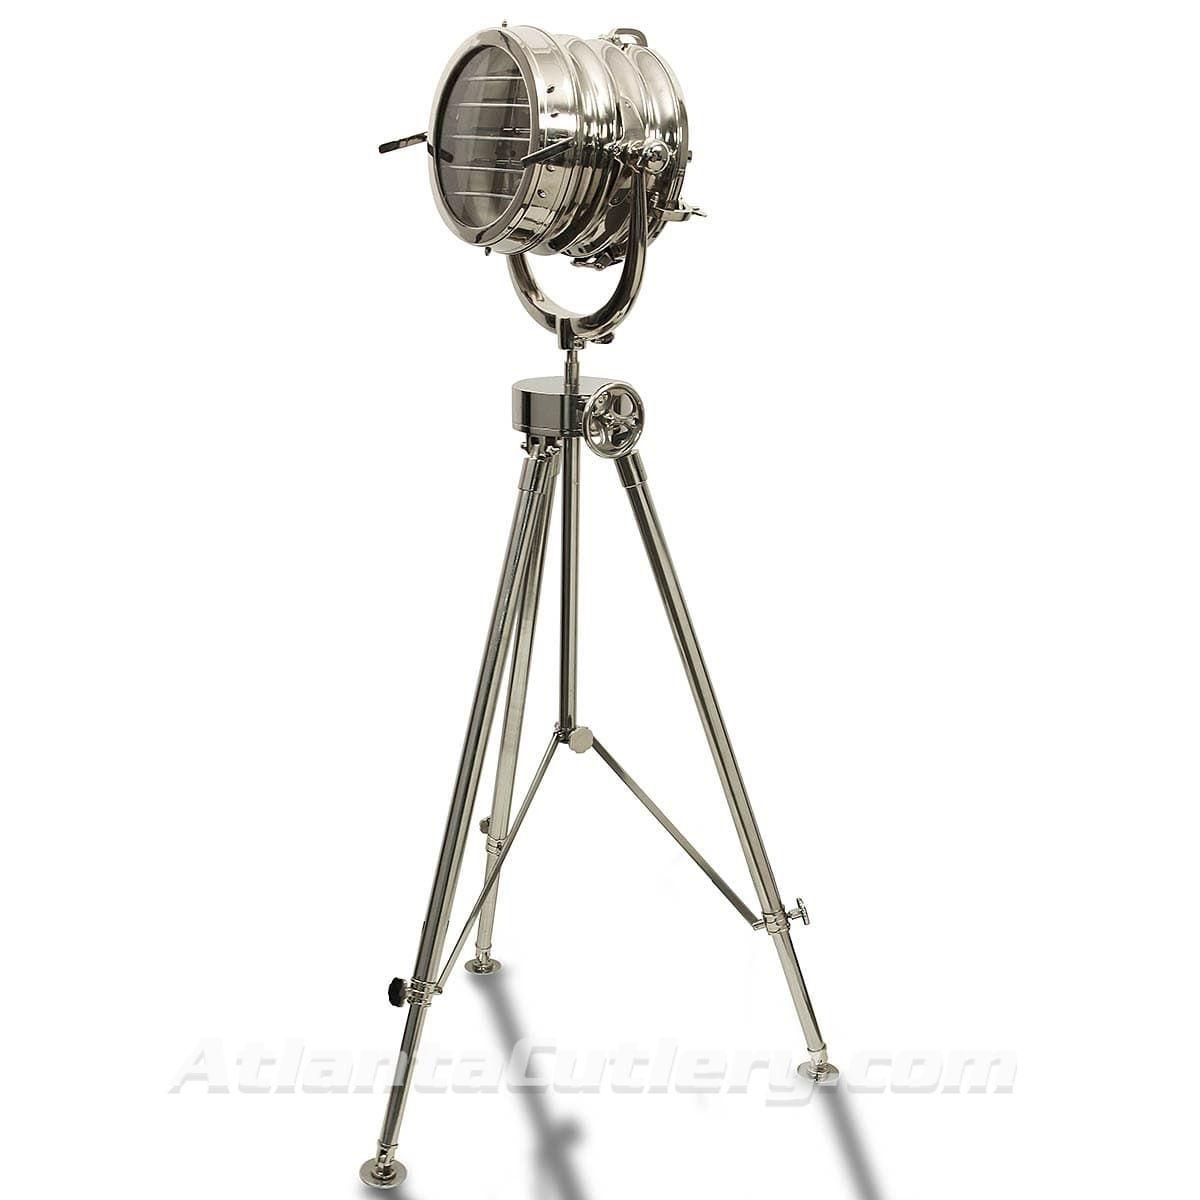 Replicas World War II Signal Lamp on Stand